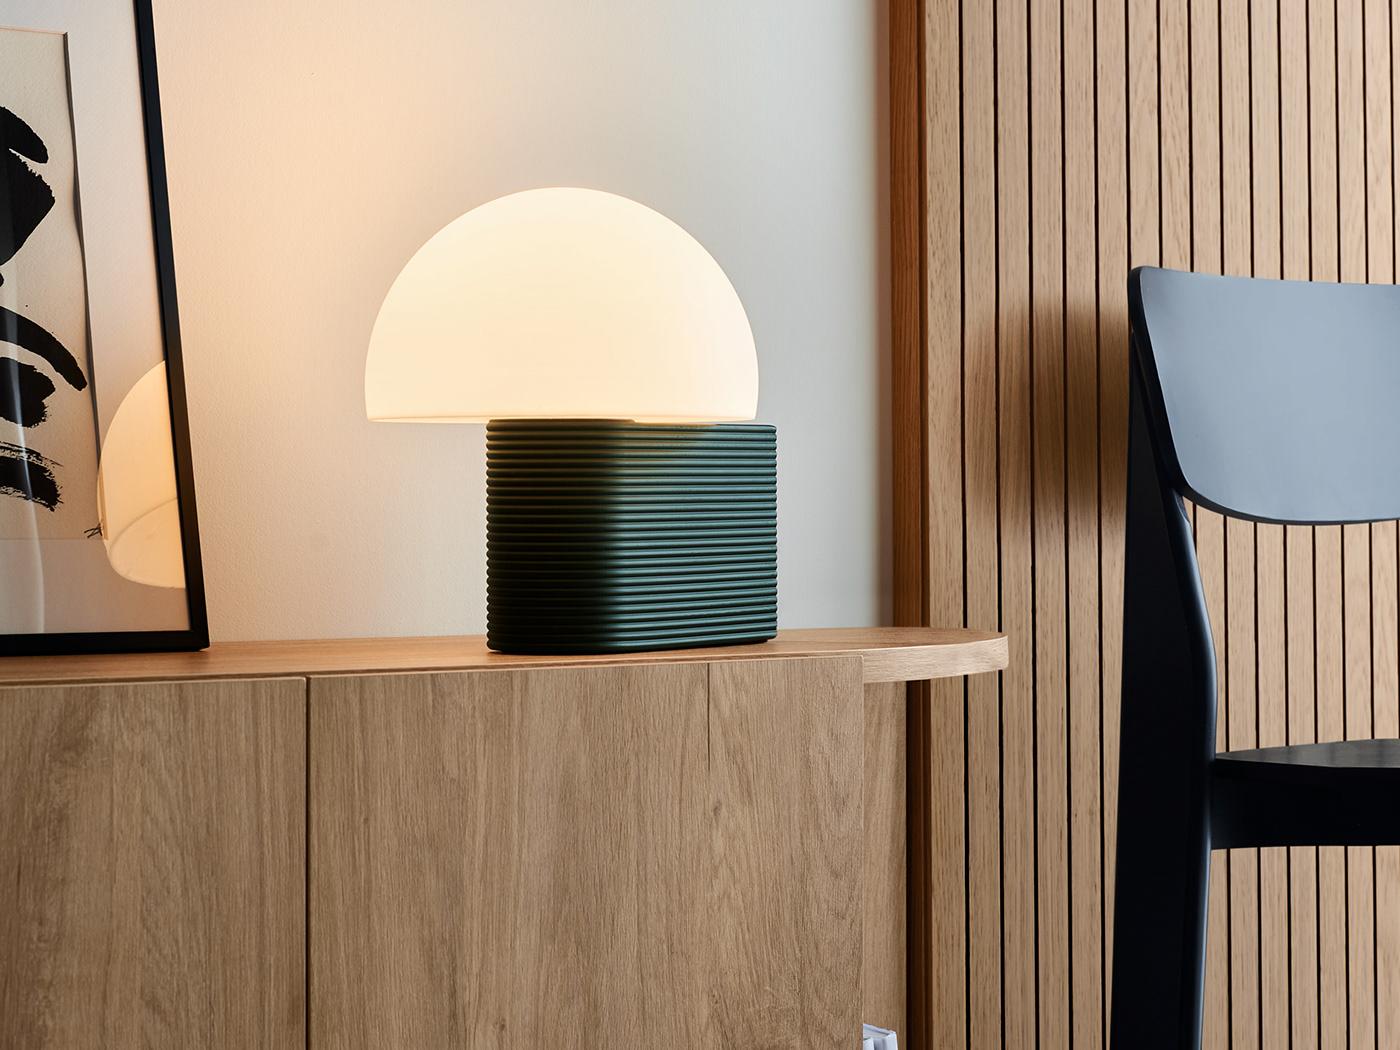 3dprinting ArtDirection gantri Lamp lighting product